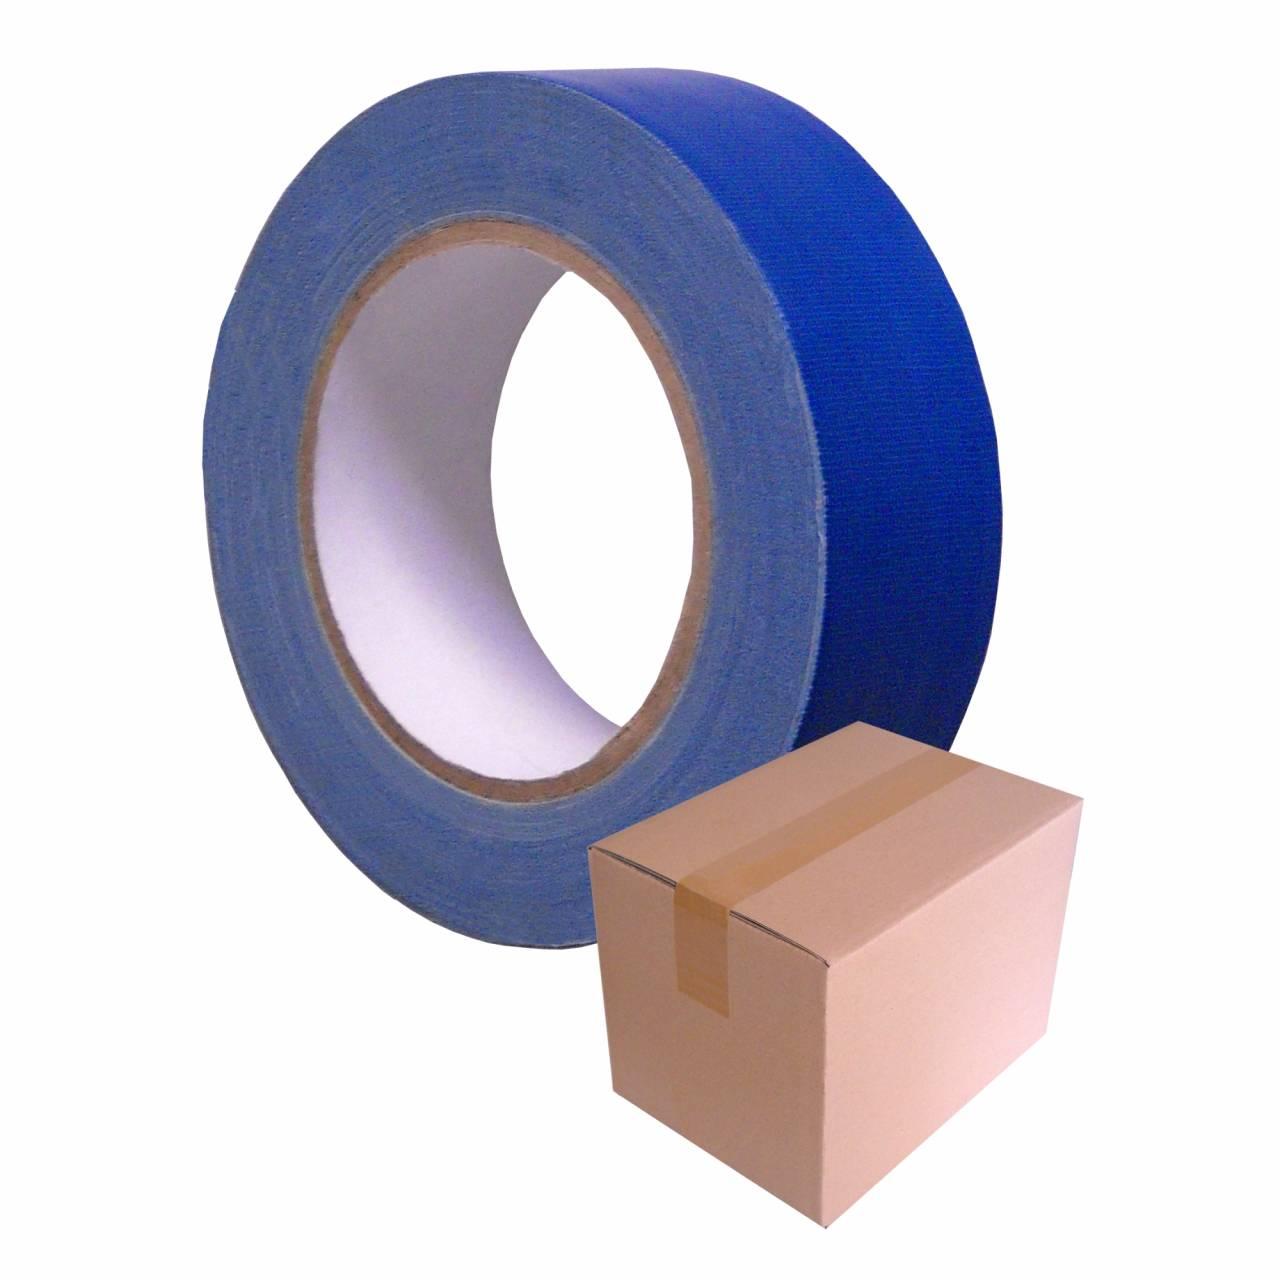 Gewebe-Klebeband T104 UV-blau, 25 mm x 25 m / Krt a 48 Rollen